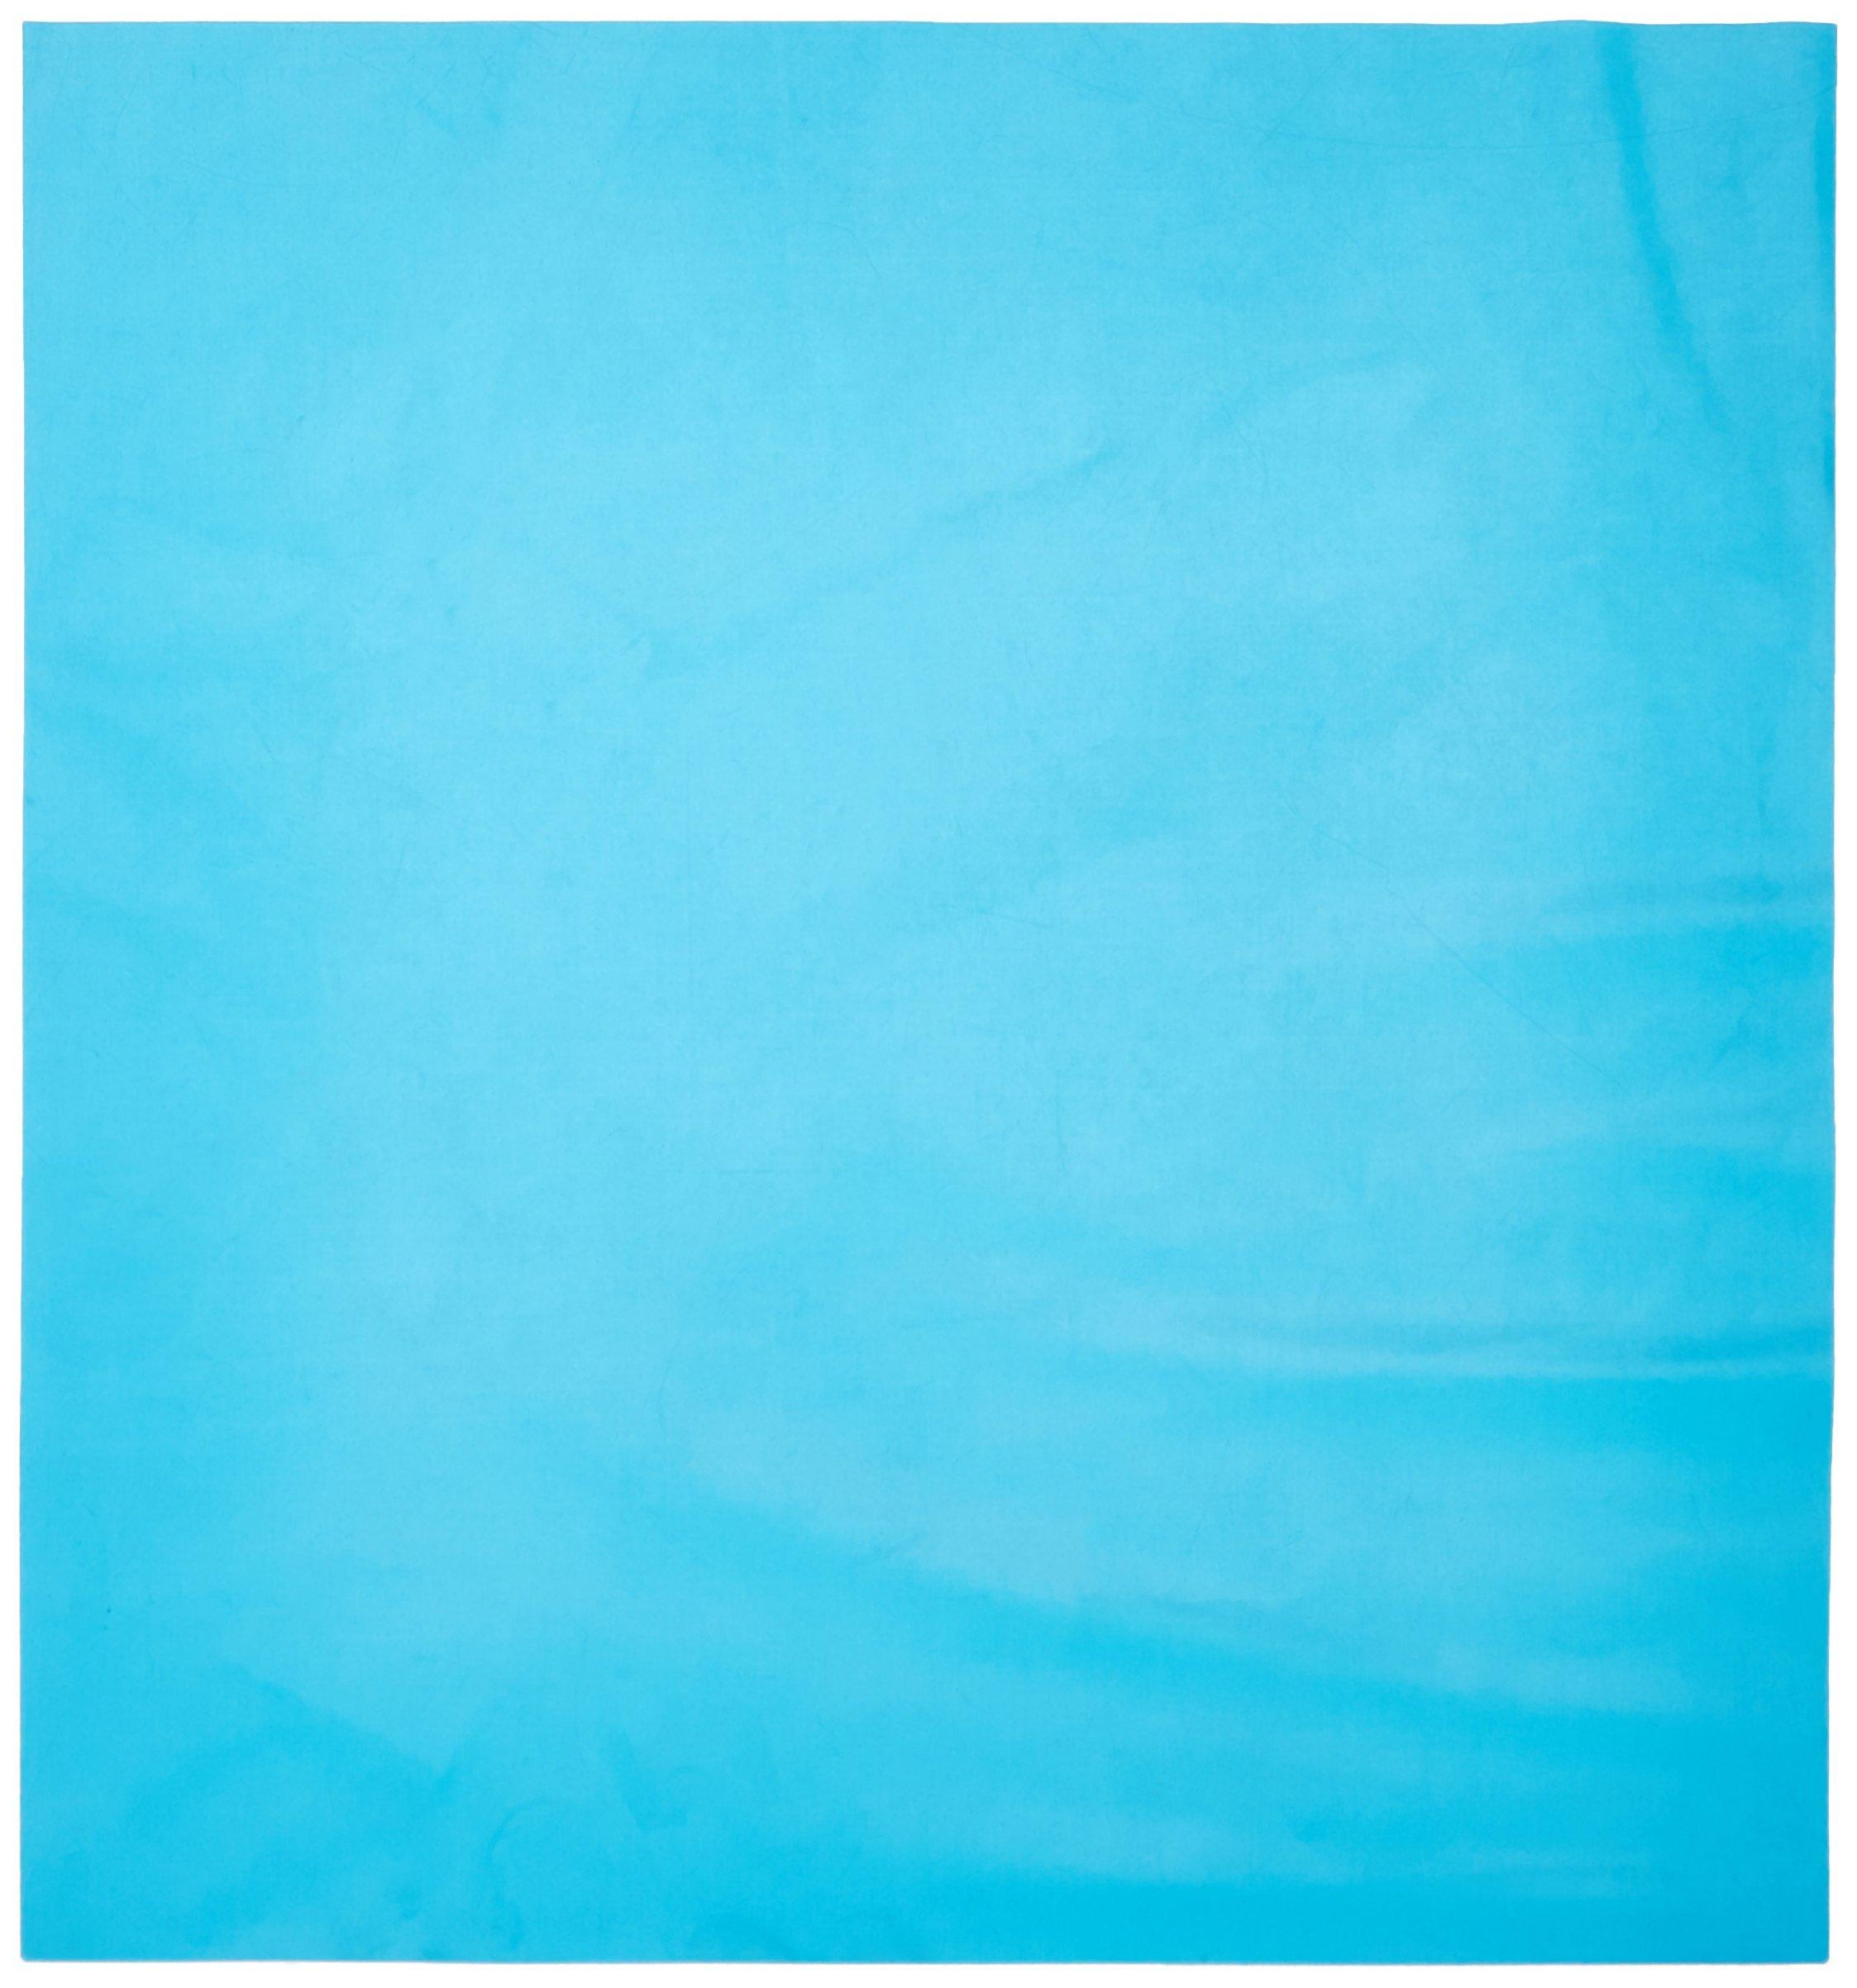 Crosstex 19300 Dental Dam, Latex, Unflavored, Medium Gauge, 6'' x 6'' Size, Blue (Pack of 36) by Crosstex (Image #1)